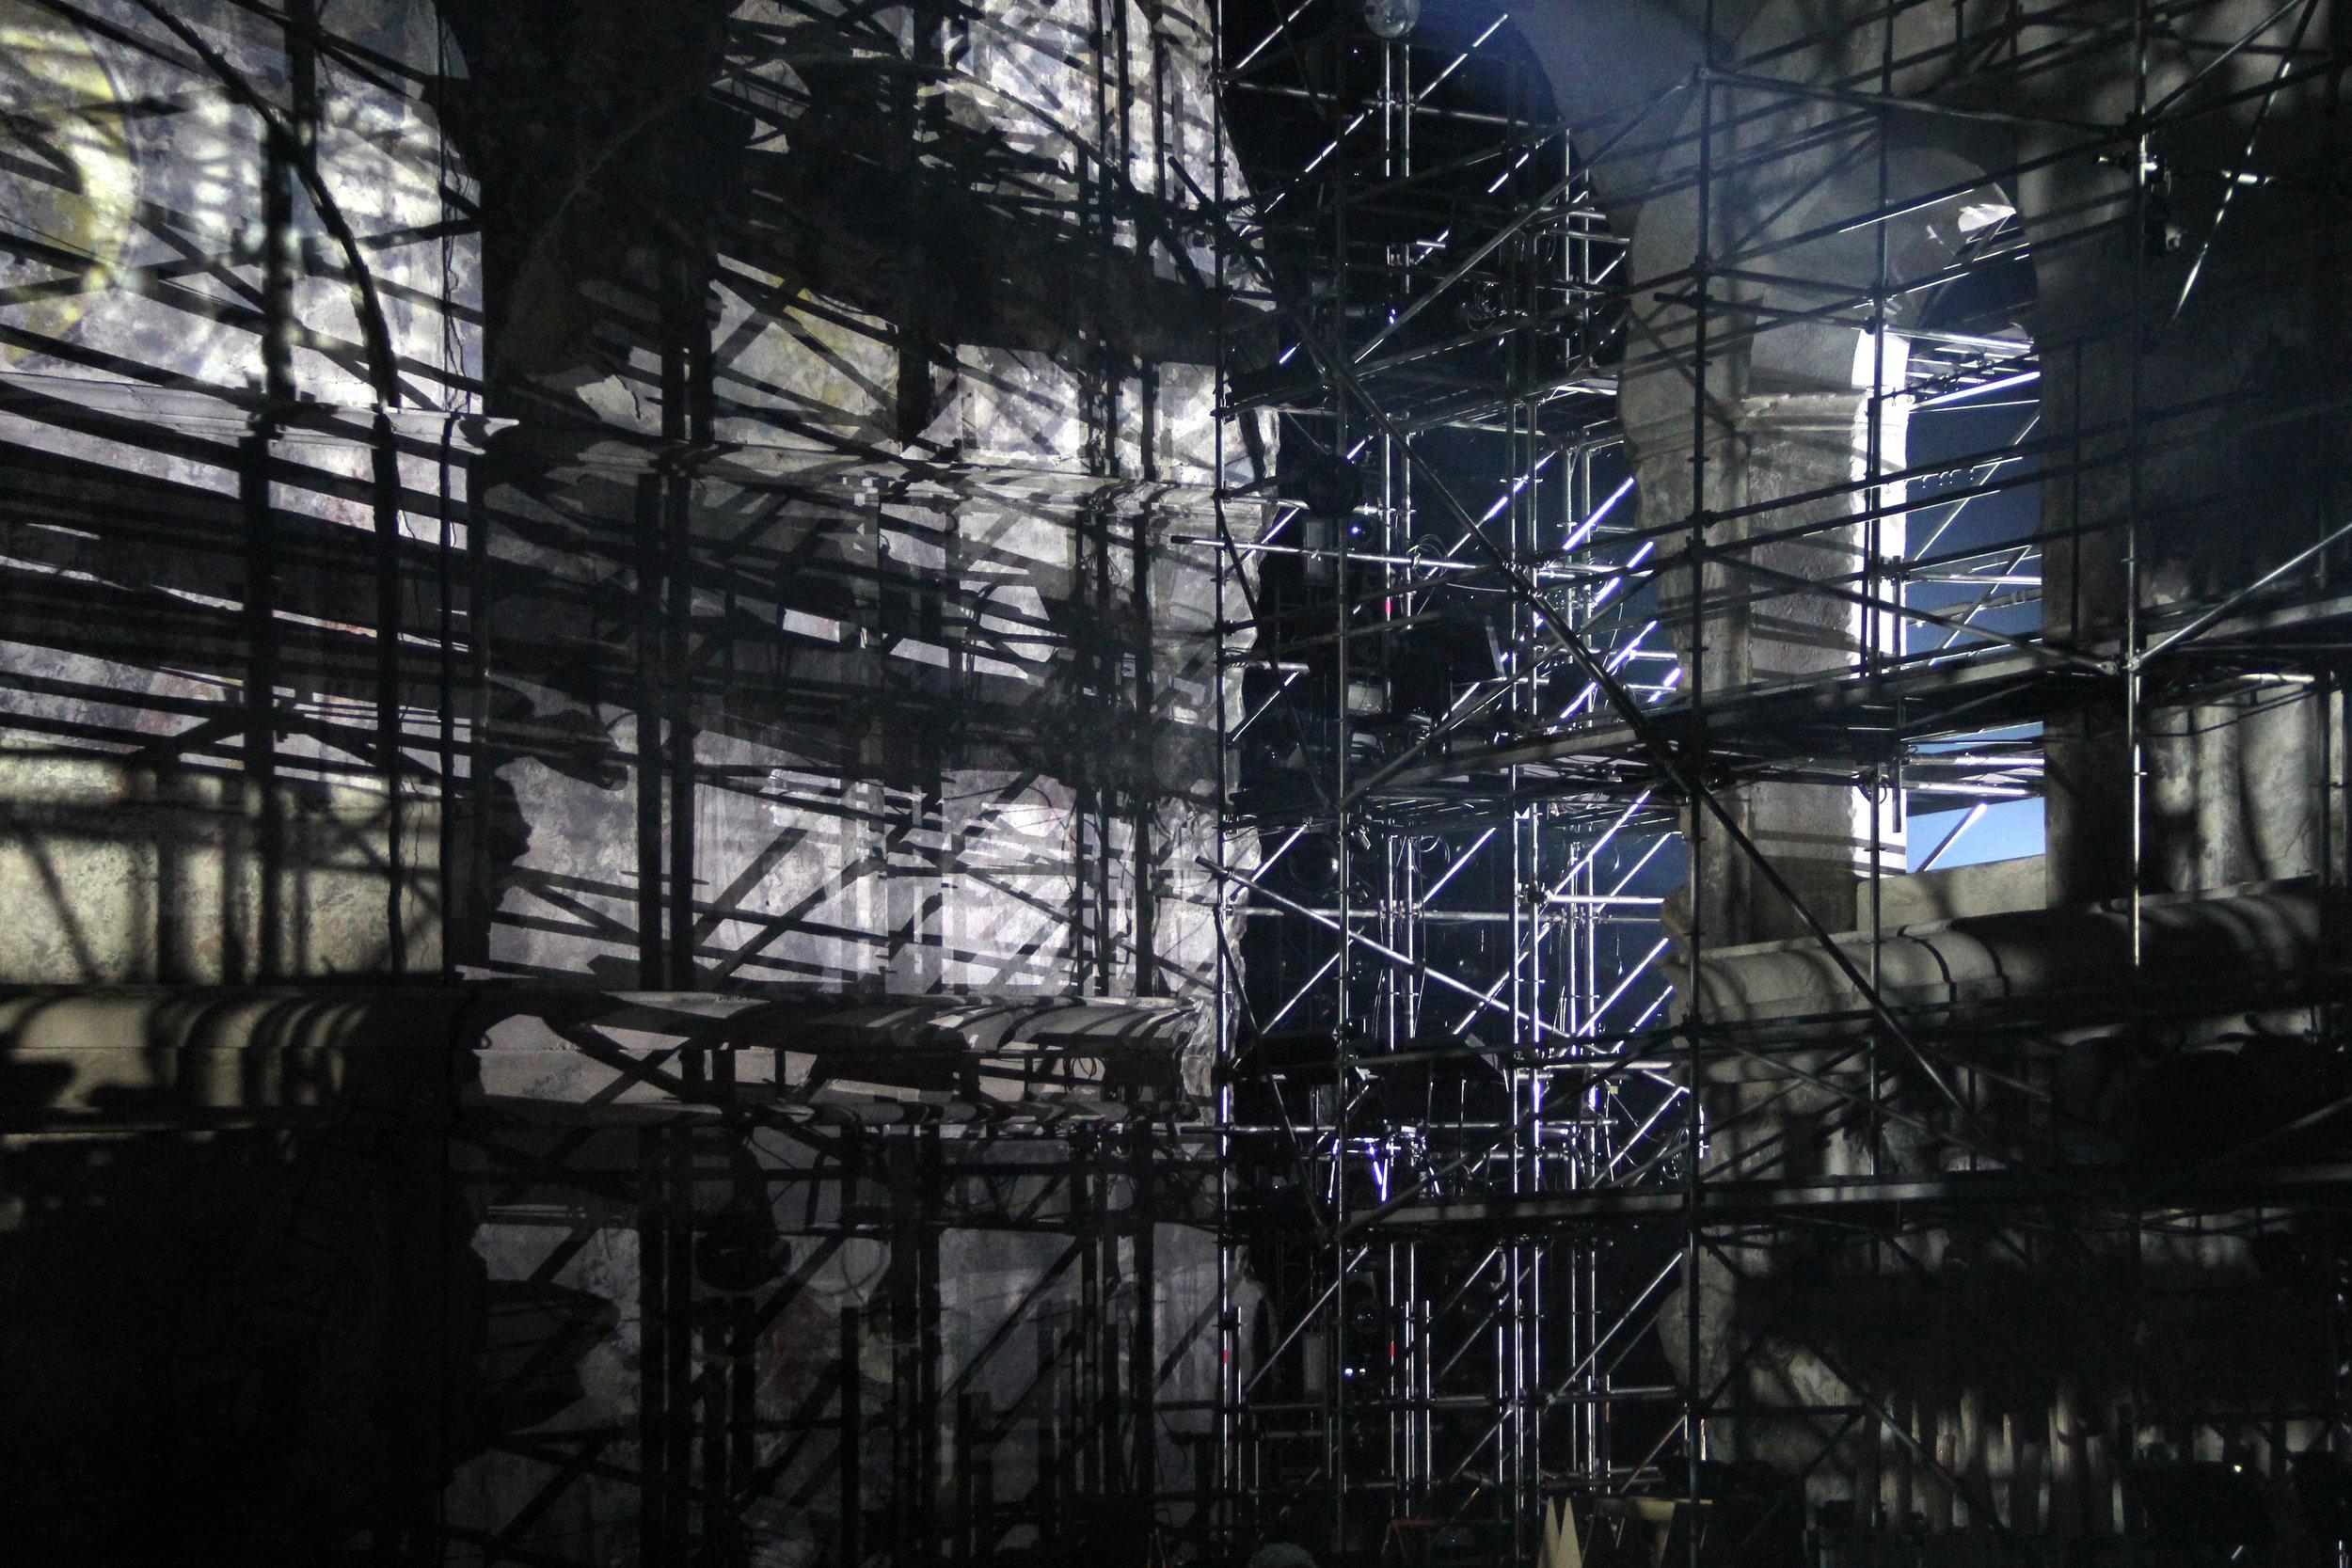 Jesus-Christ-Superstar-Act-00-Scaffolding-06.JPG